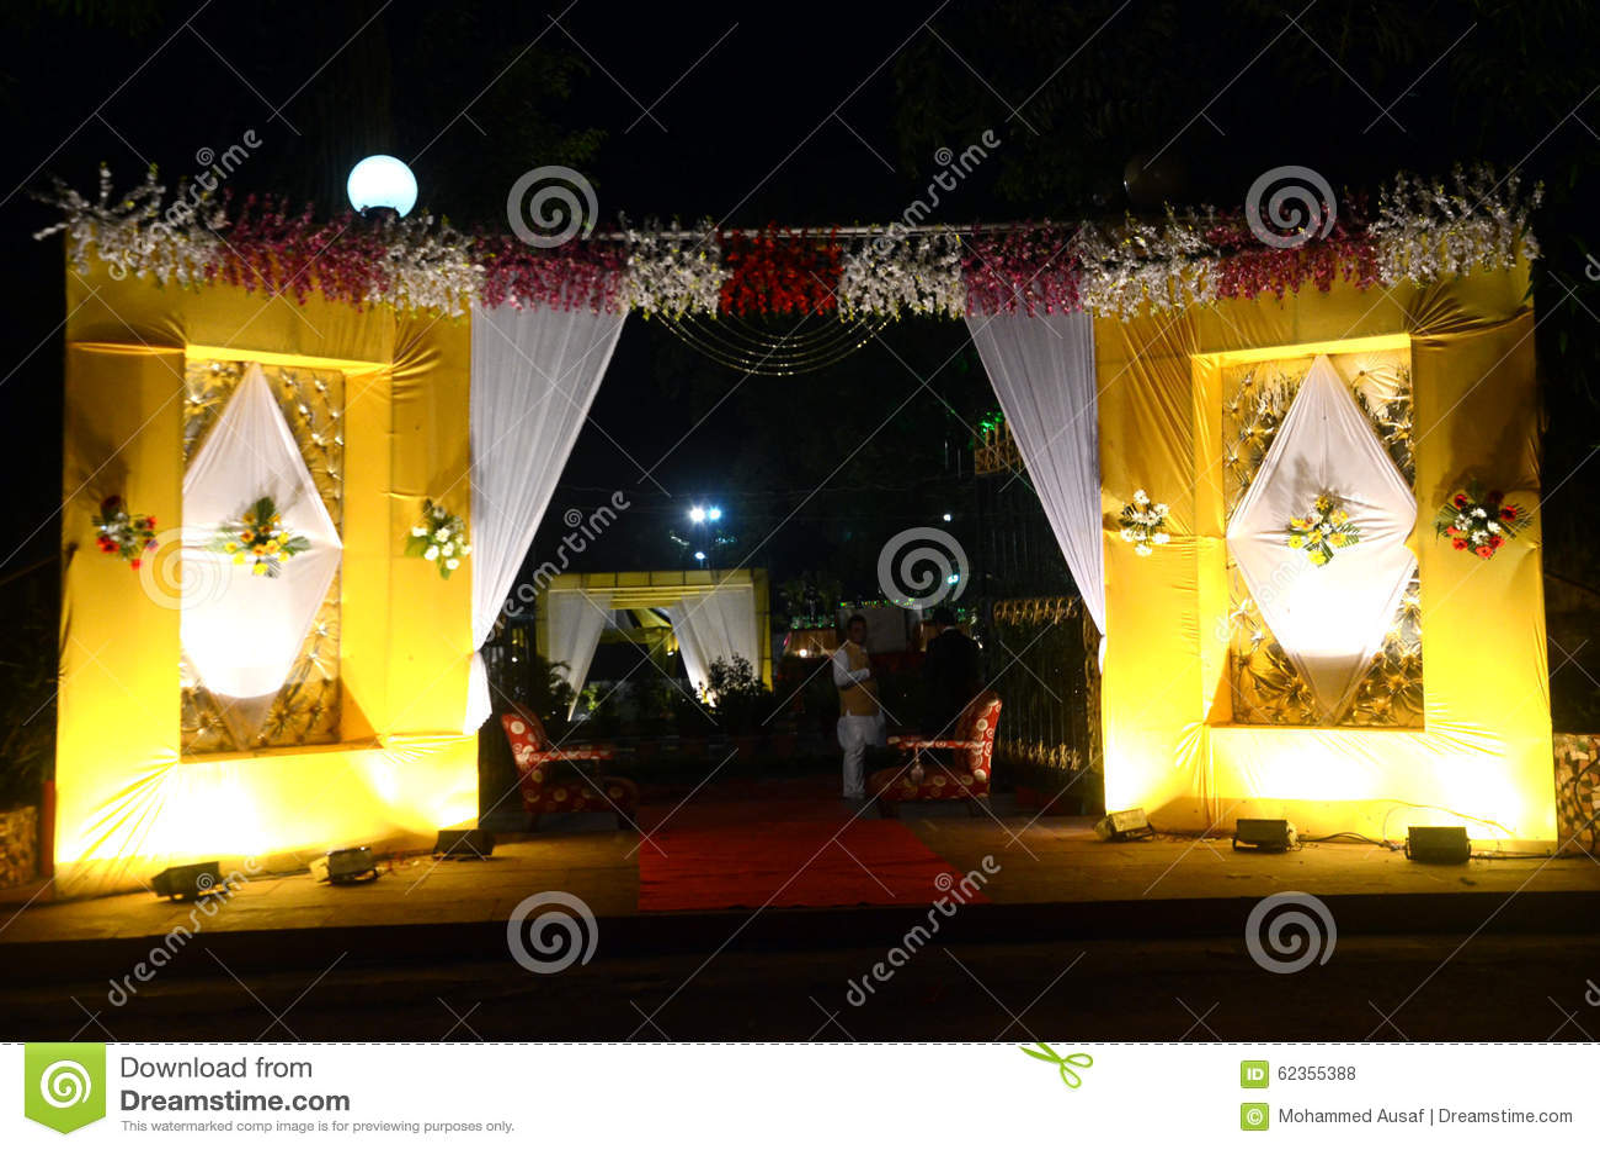 tent decoration set stock photo - image: 62355388